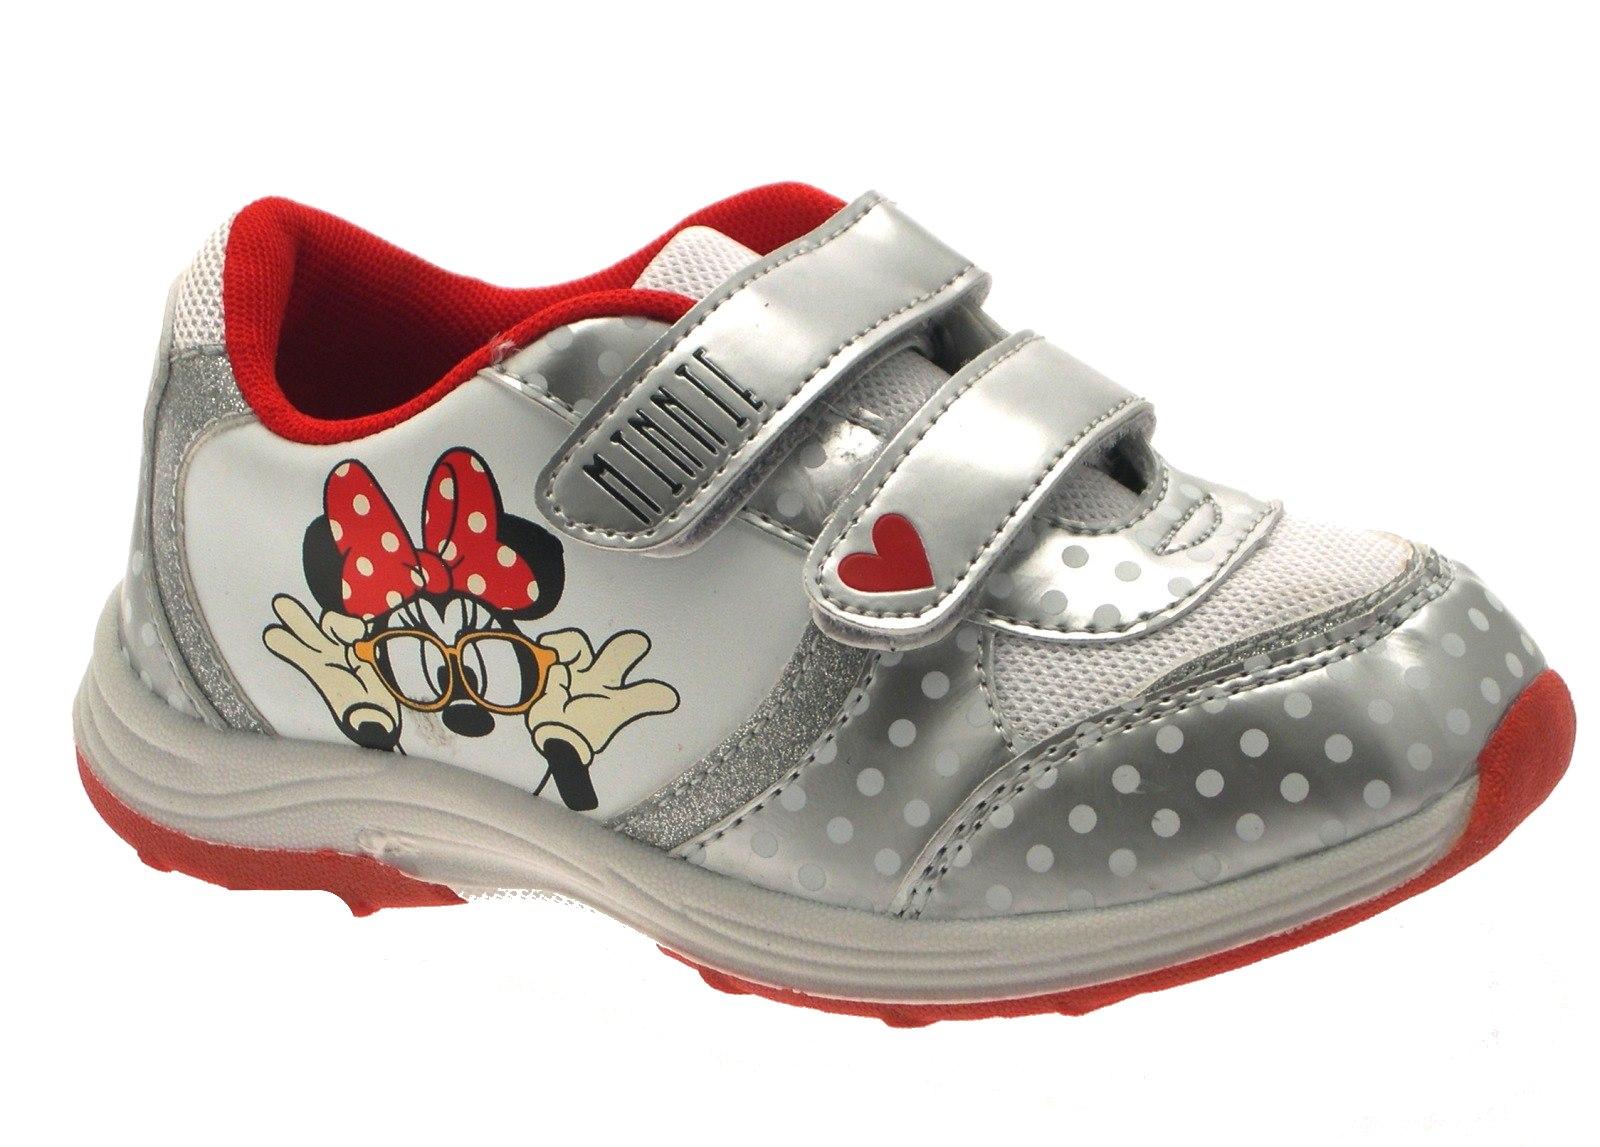 80d0c8f8382 Girls Disney Minnie Mouse Trainers Flat Pumps Childrens Shoes Size UK 10 -  2.5